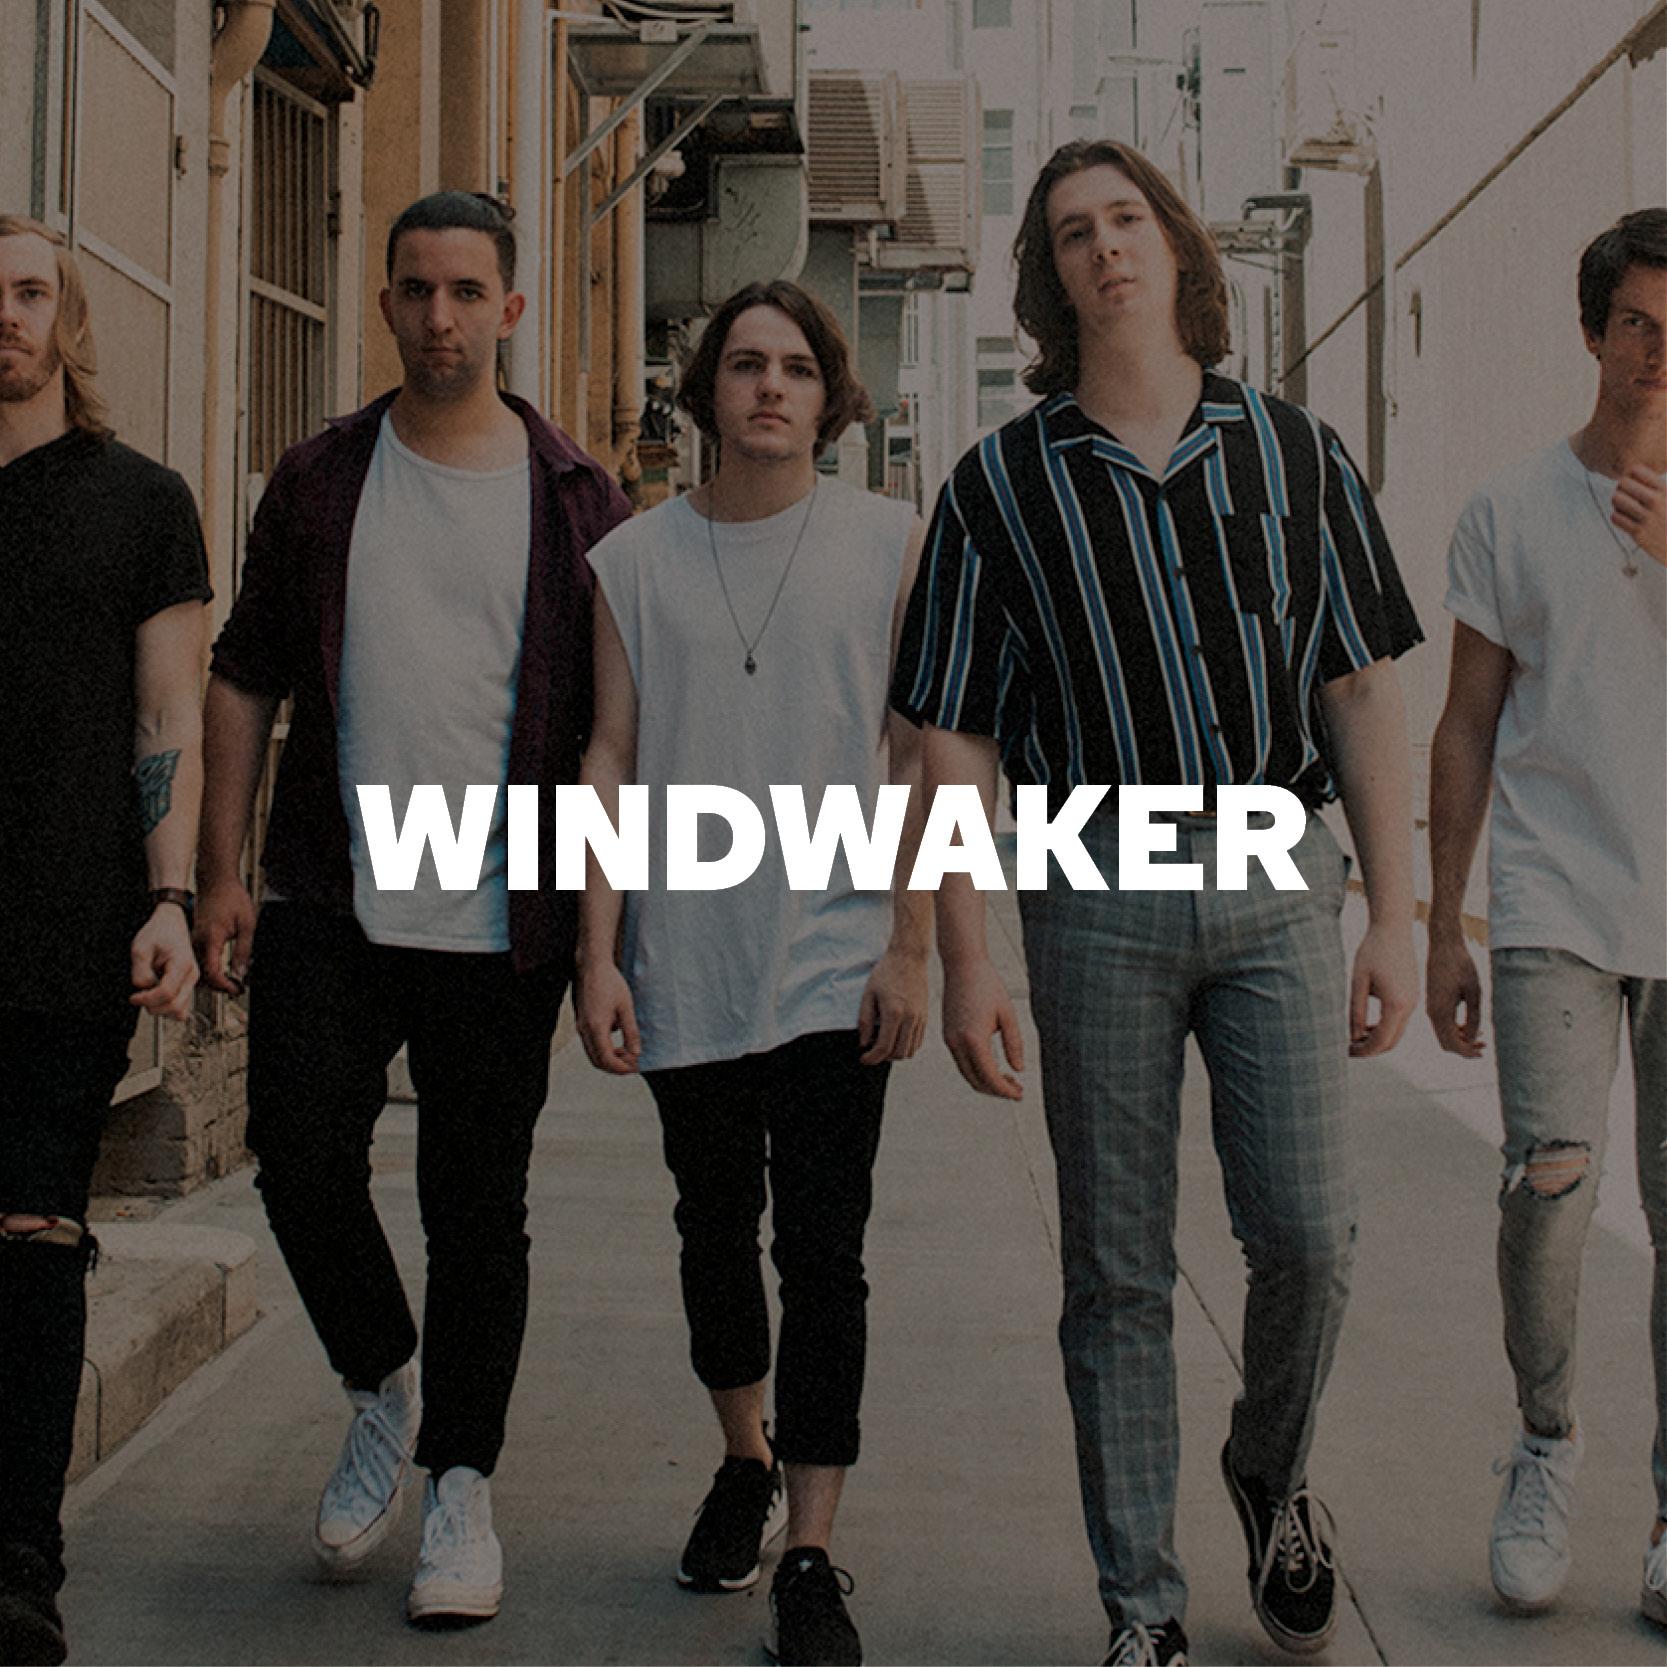 WINDWAKER